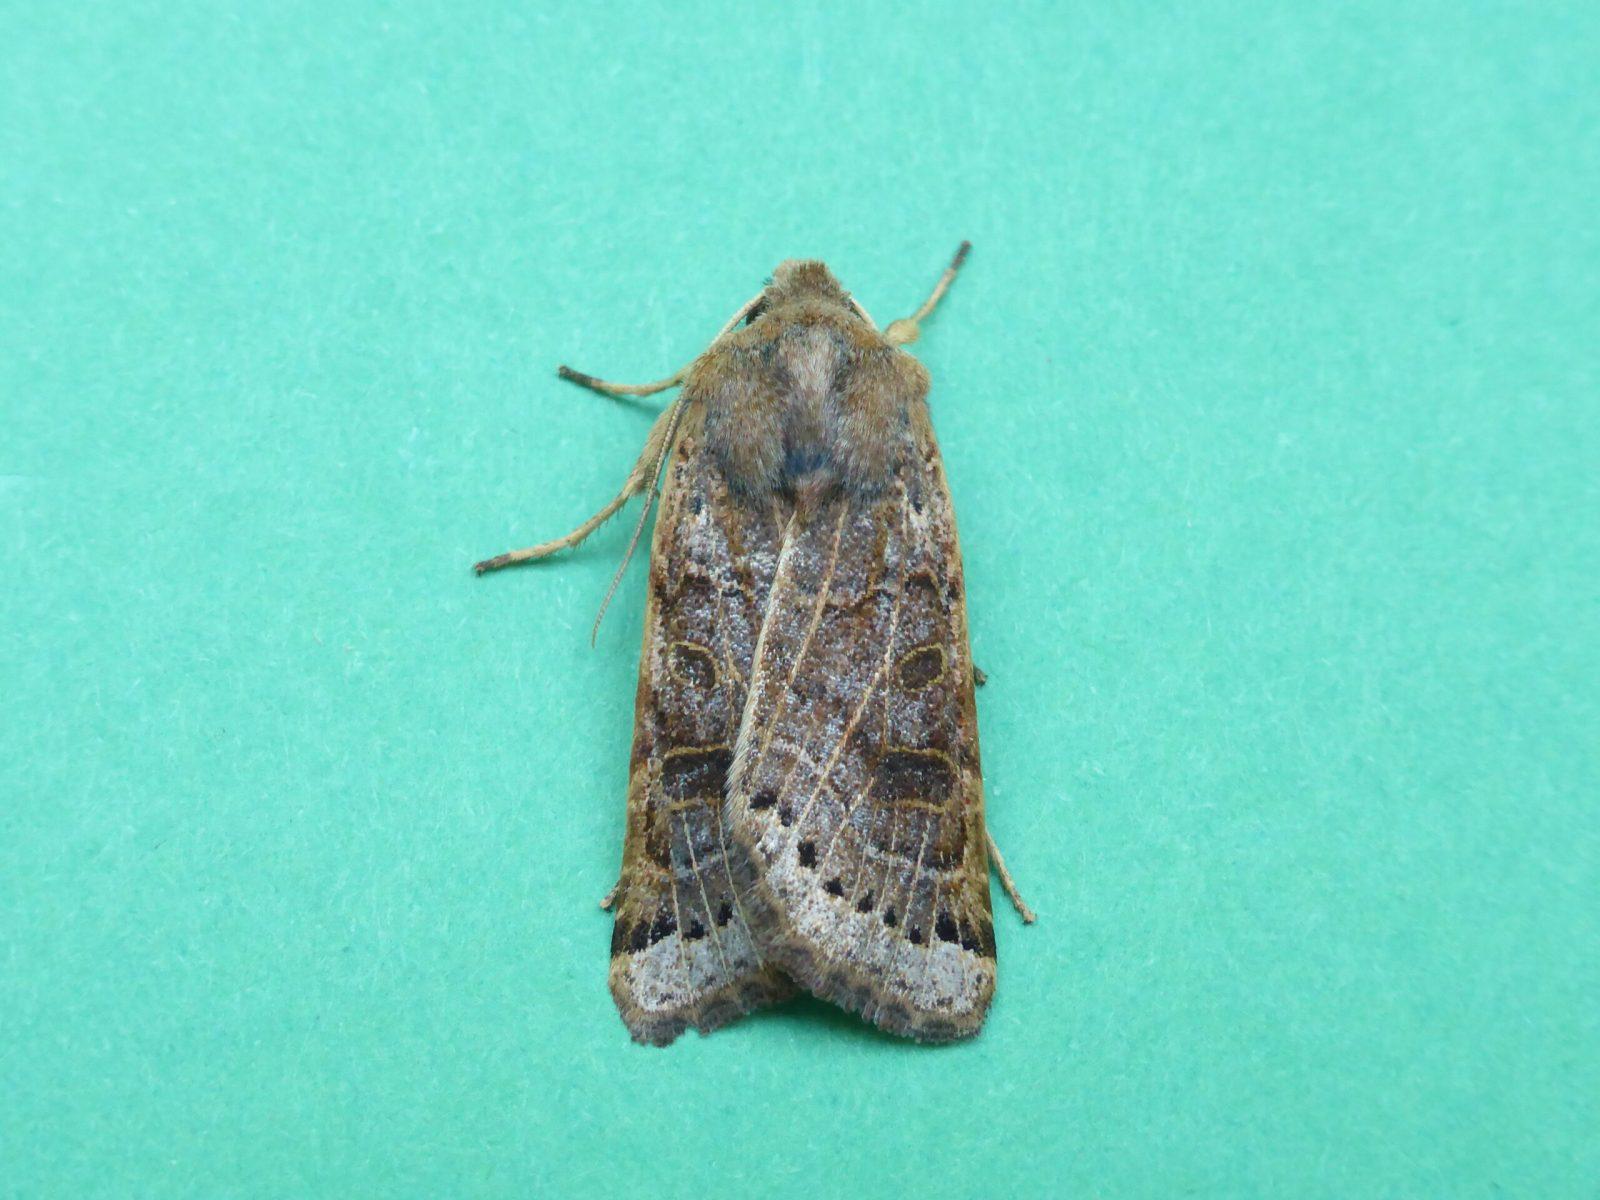 Omphaloscelis lunosa - Lunar Underwing - KIrk Smeaton